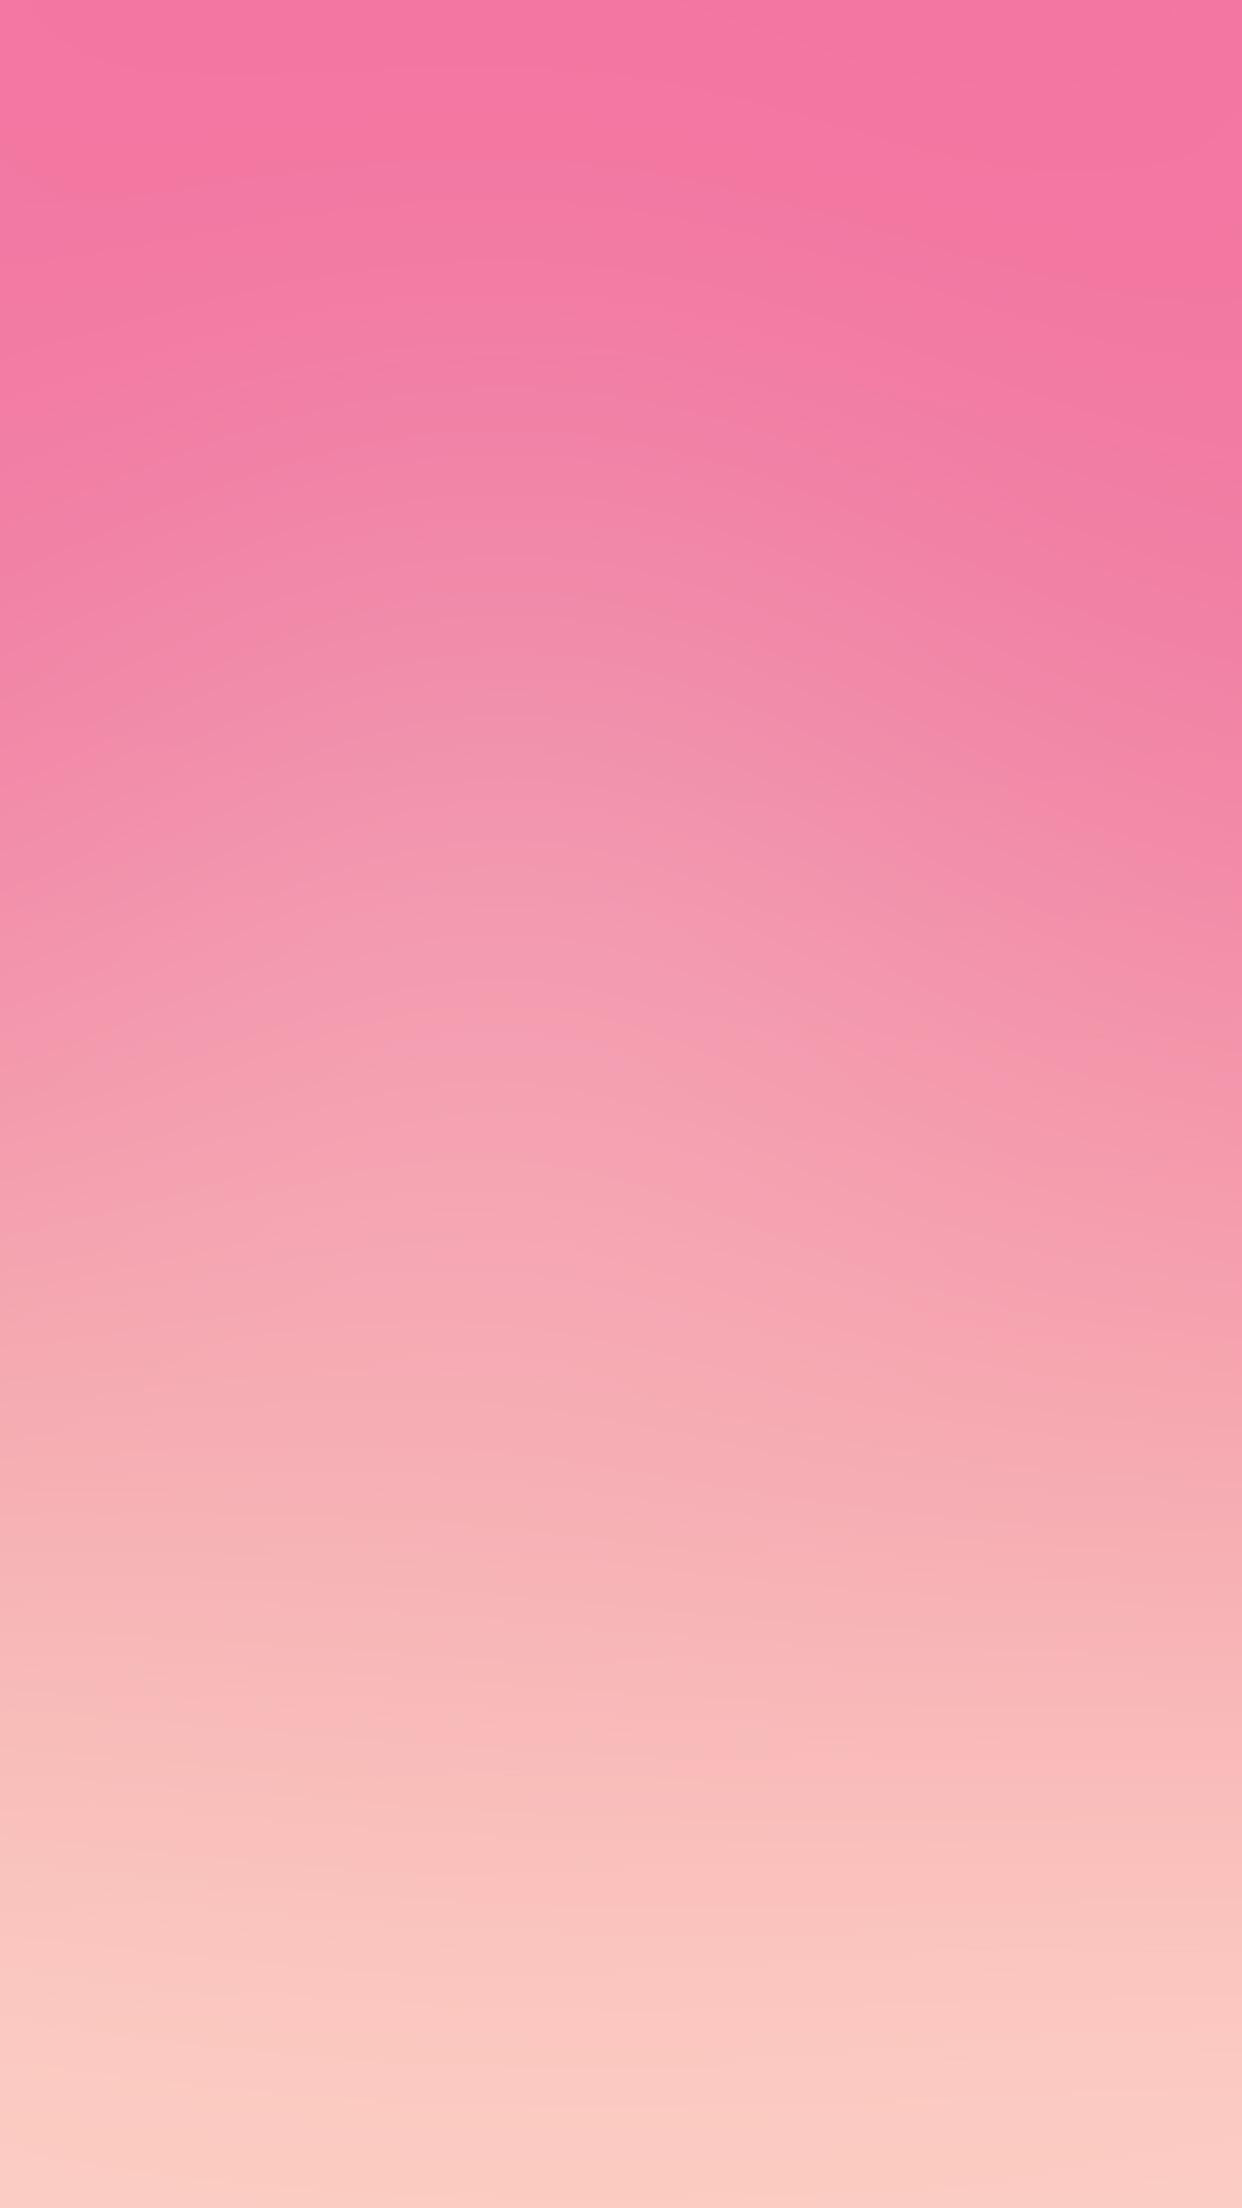 Iphonepapers Com Iphone 8 Wallpaper Sh80 Pink Yellow